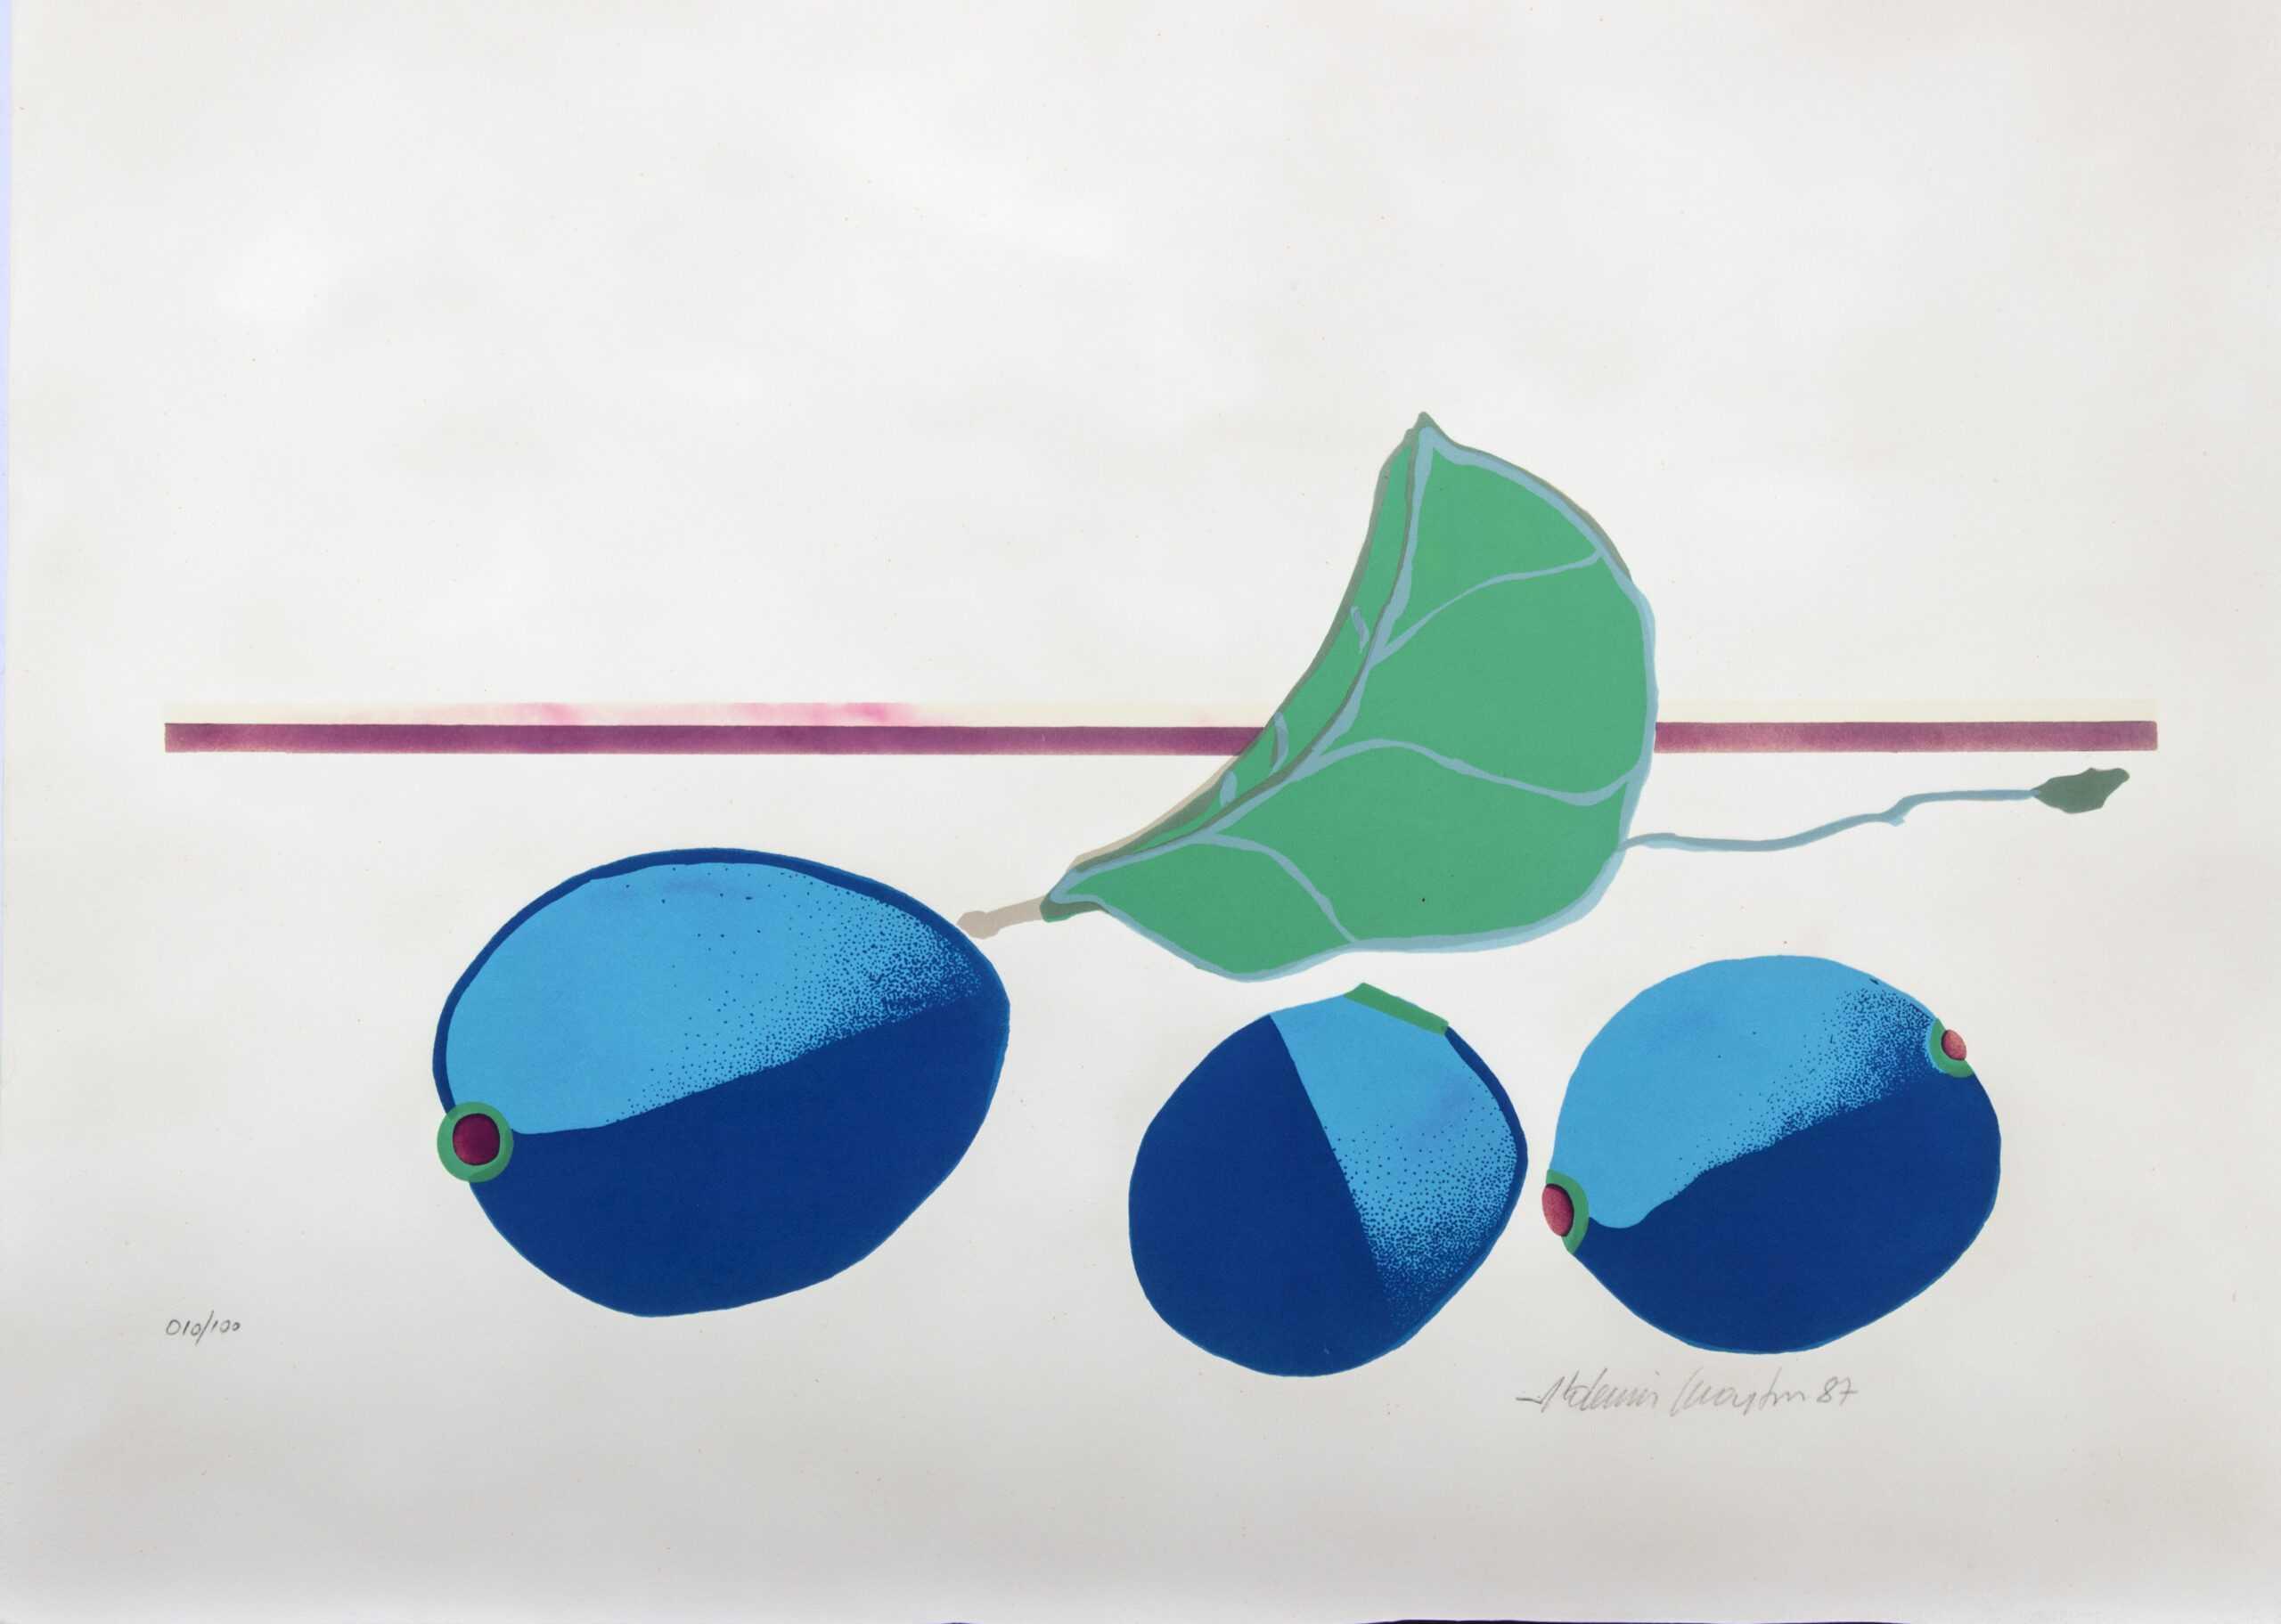 500 - Aldemir Martins - 50x70cm - Serigrafia - Tiragem 100 (5)